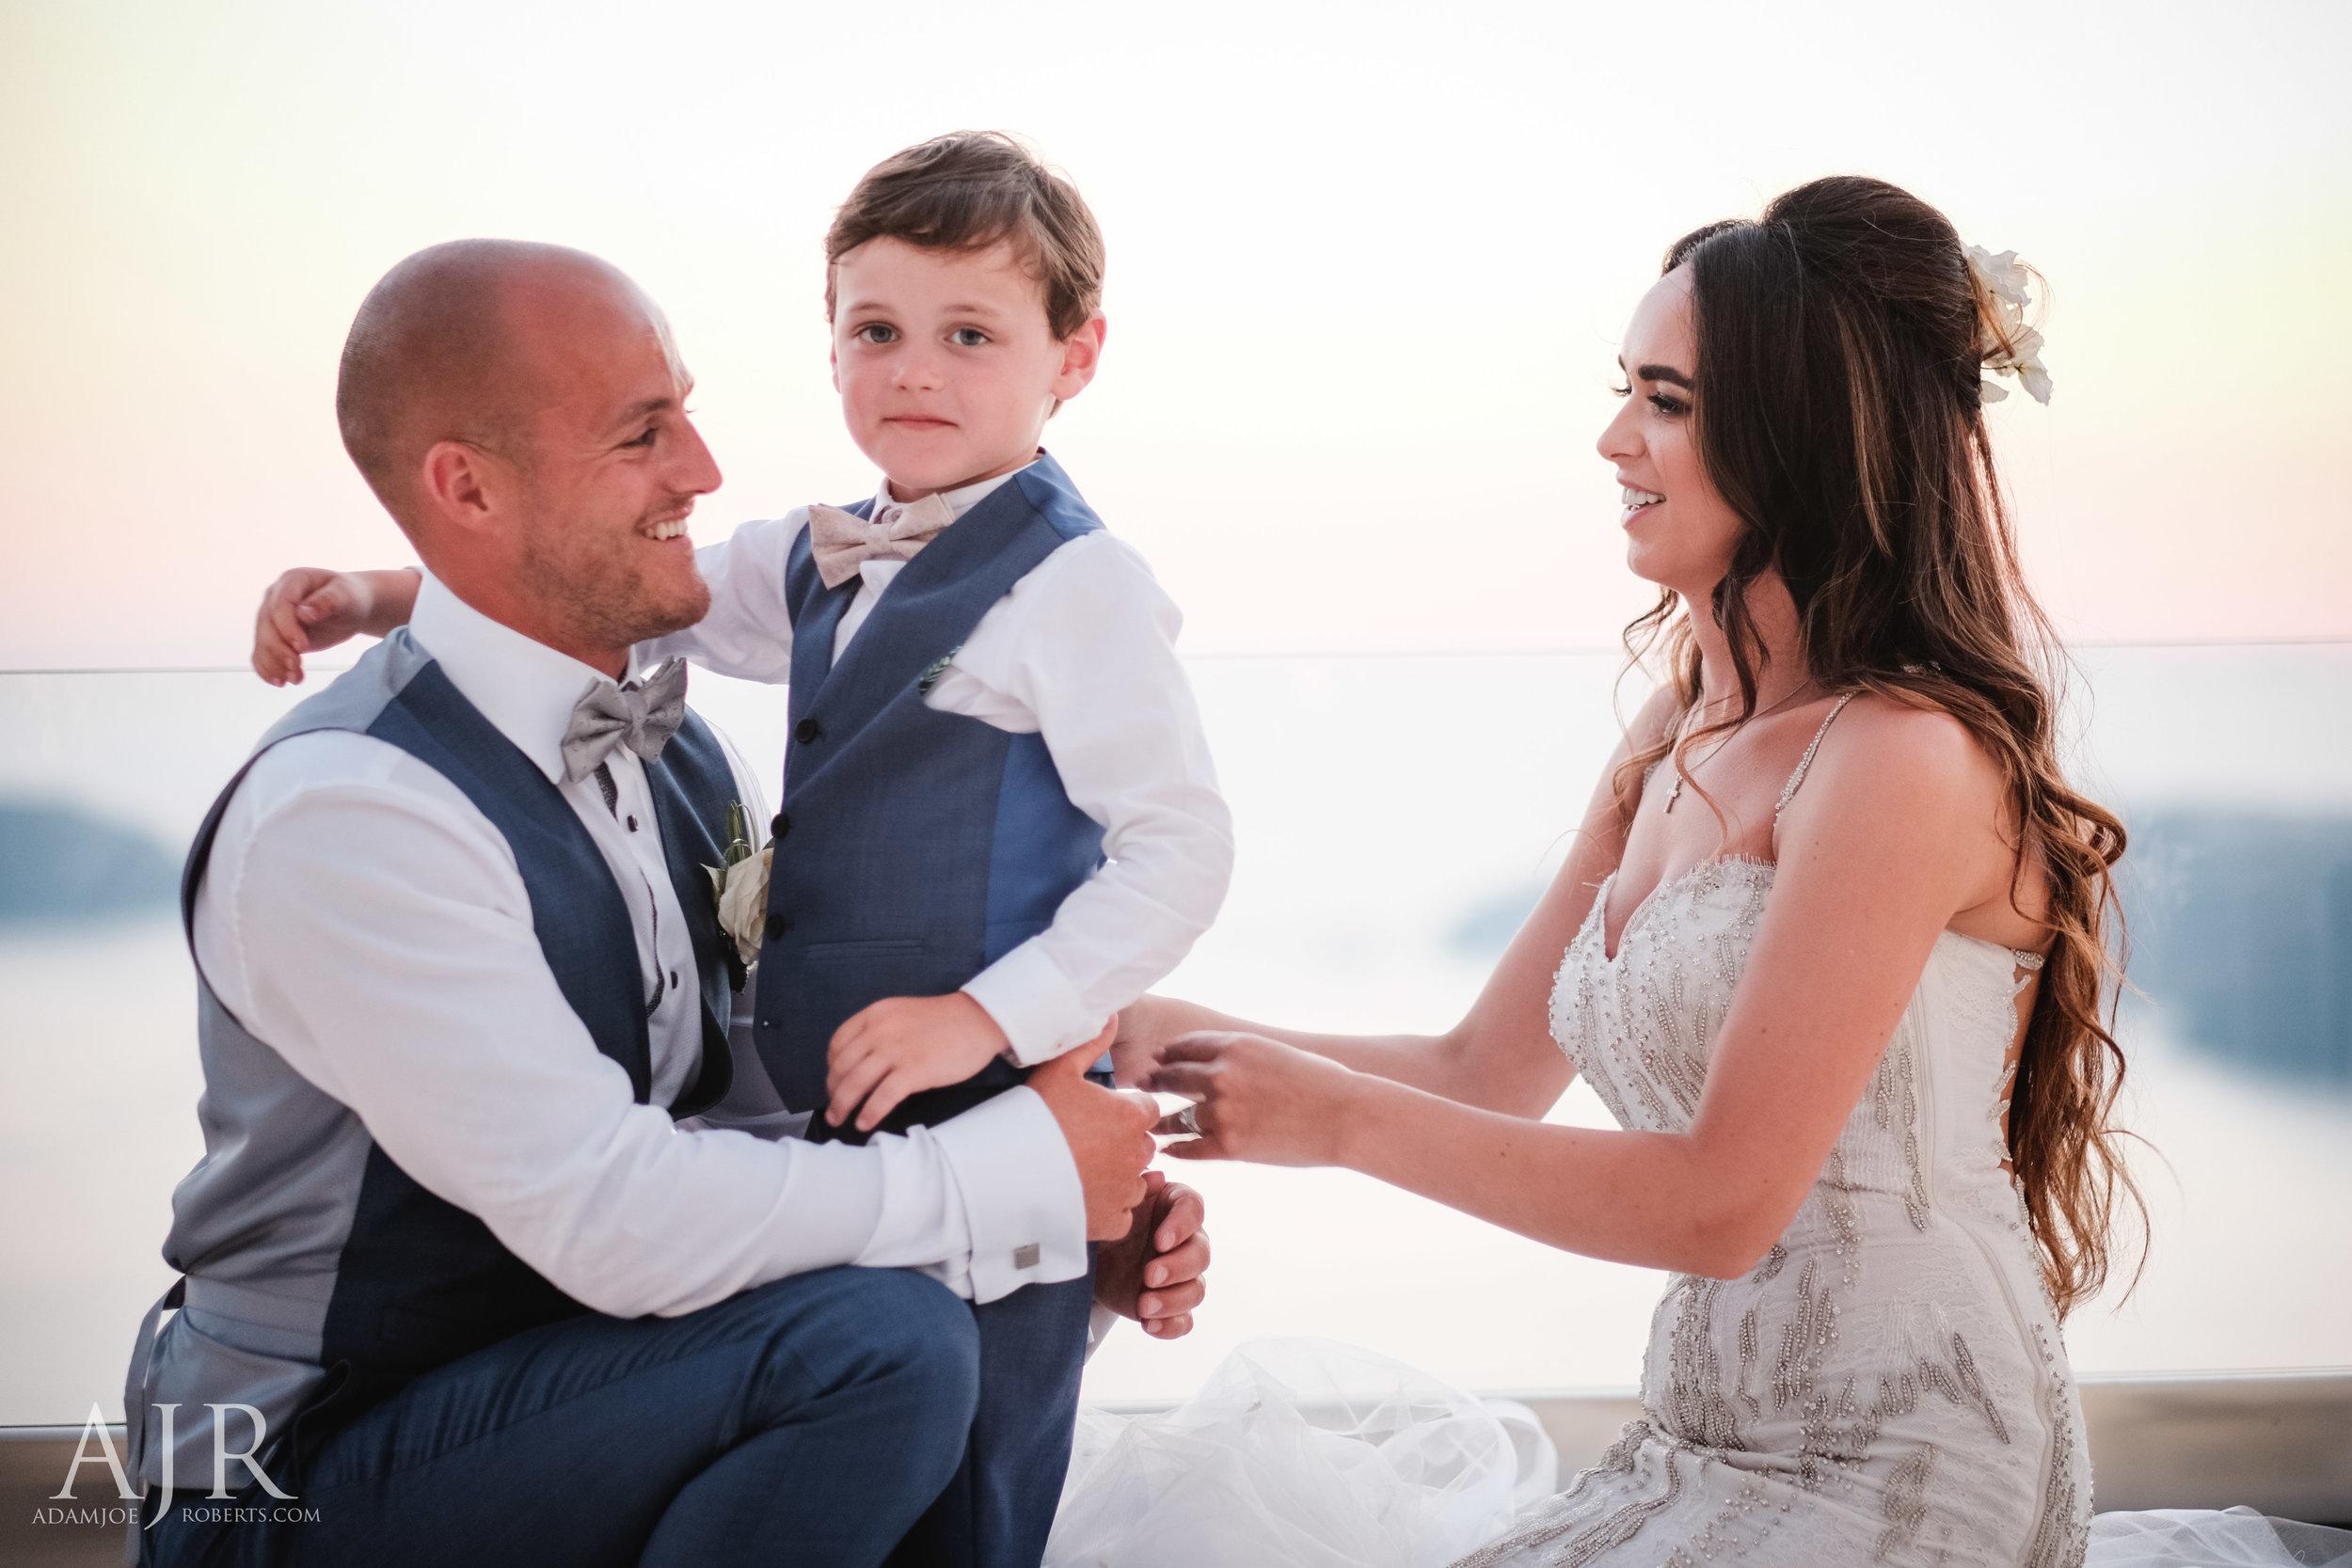 Mollie and Antony Le Ciel Santorini Destination Wedding - Sneak Peek (12 of 15).jpg